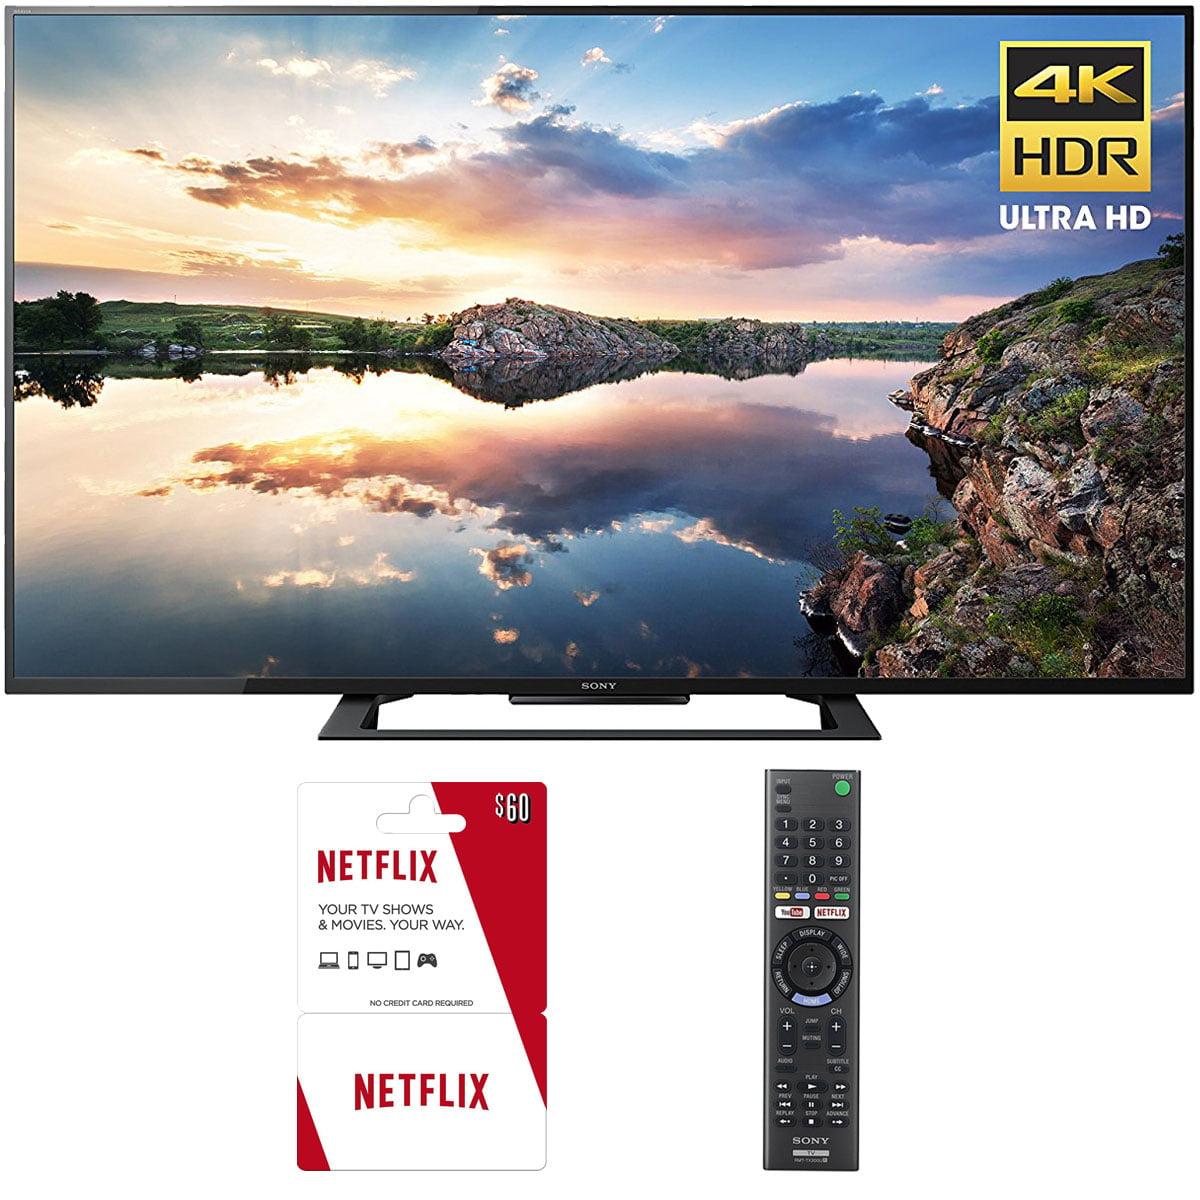 Sony KD70X690E 70-Inch 4K Ultra HD Smart LED TV (2017) Plus 1 Free Month of Netflix by Sony